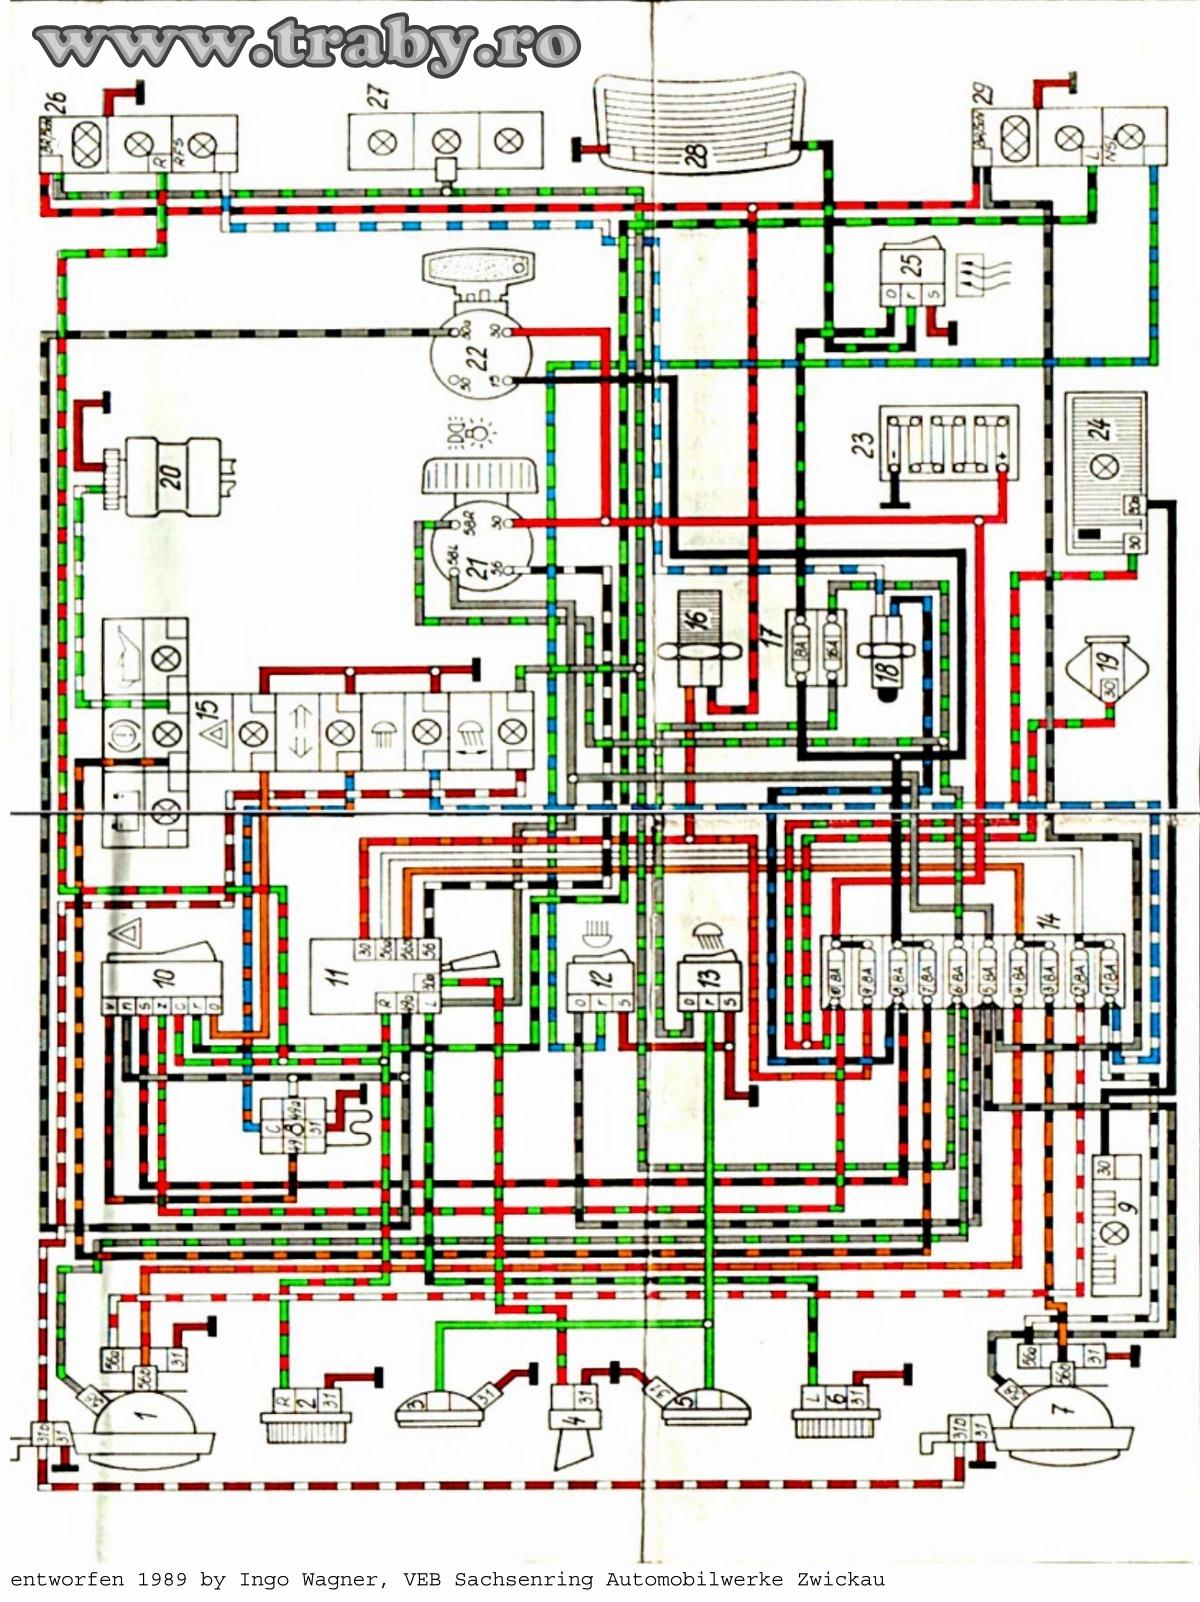 Stromlaufplan10001.jpg